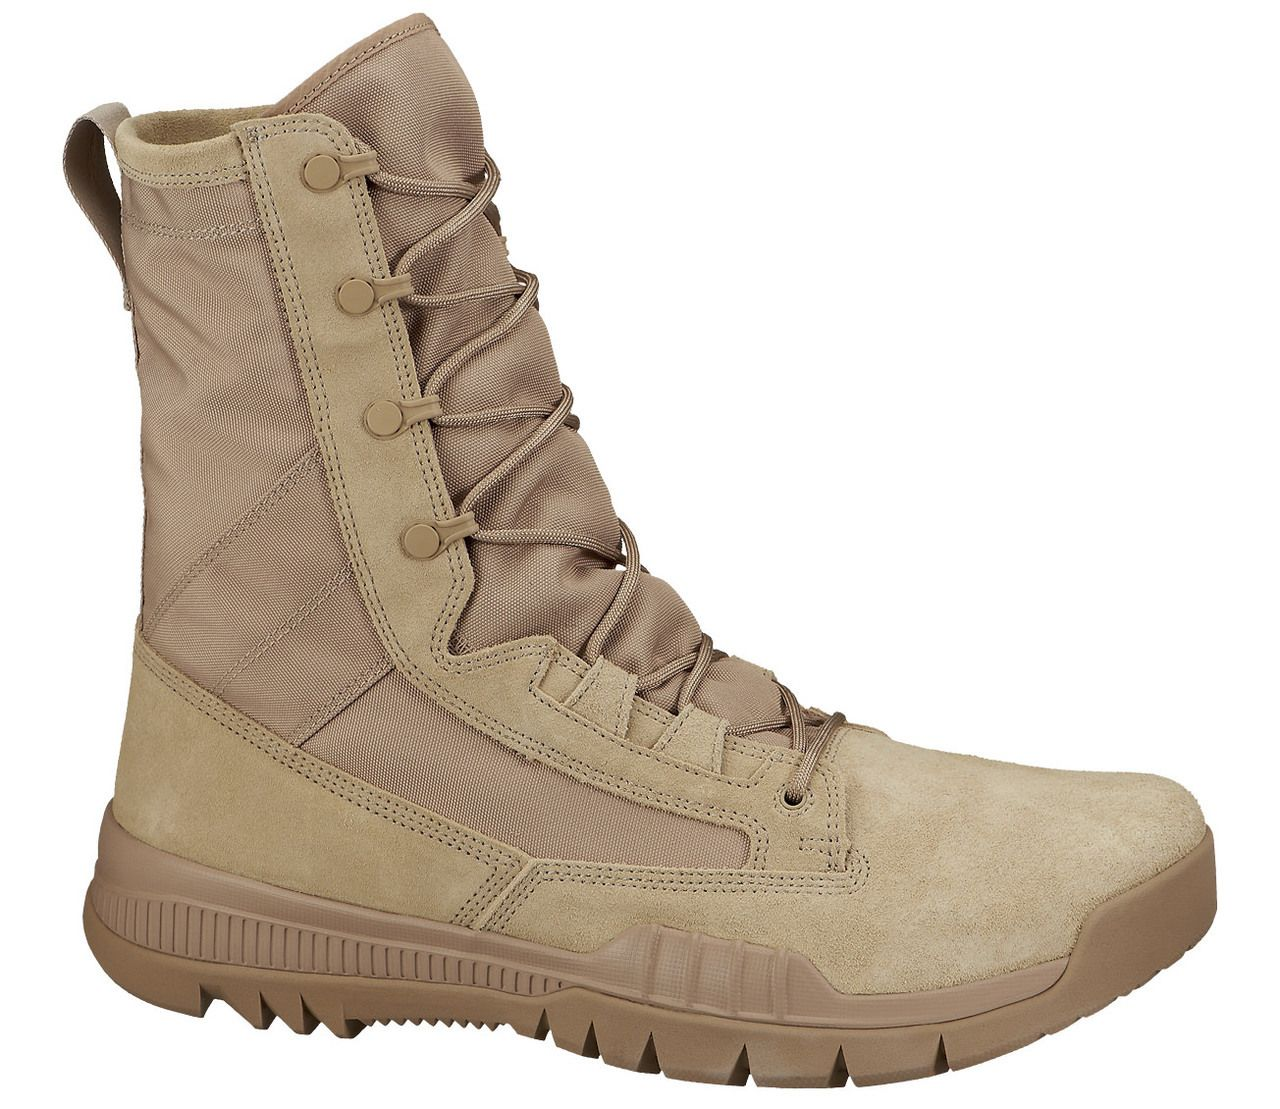 Nike SFB Field Tactical Boots (Desert Tan)